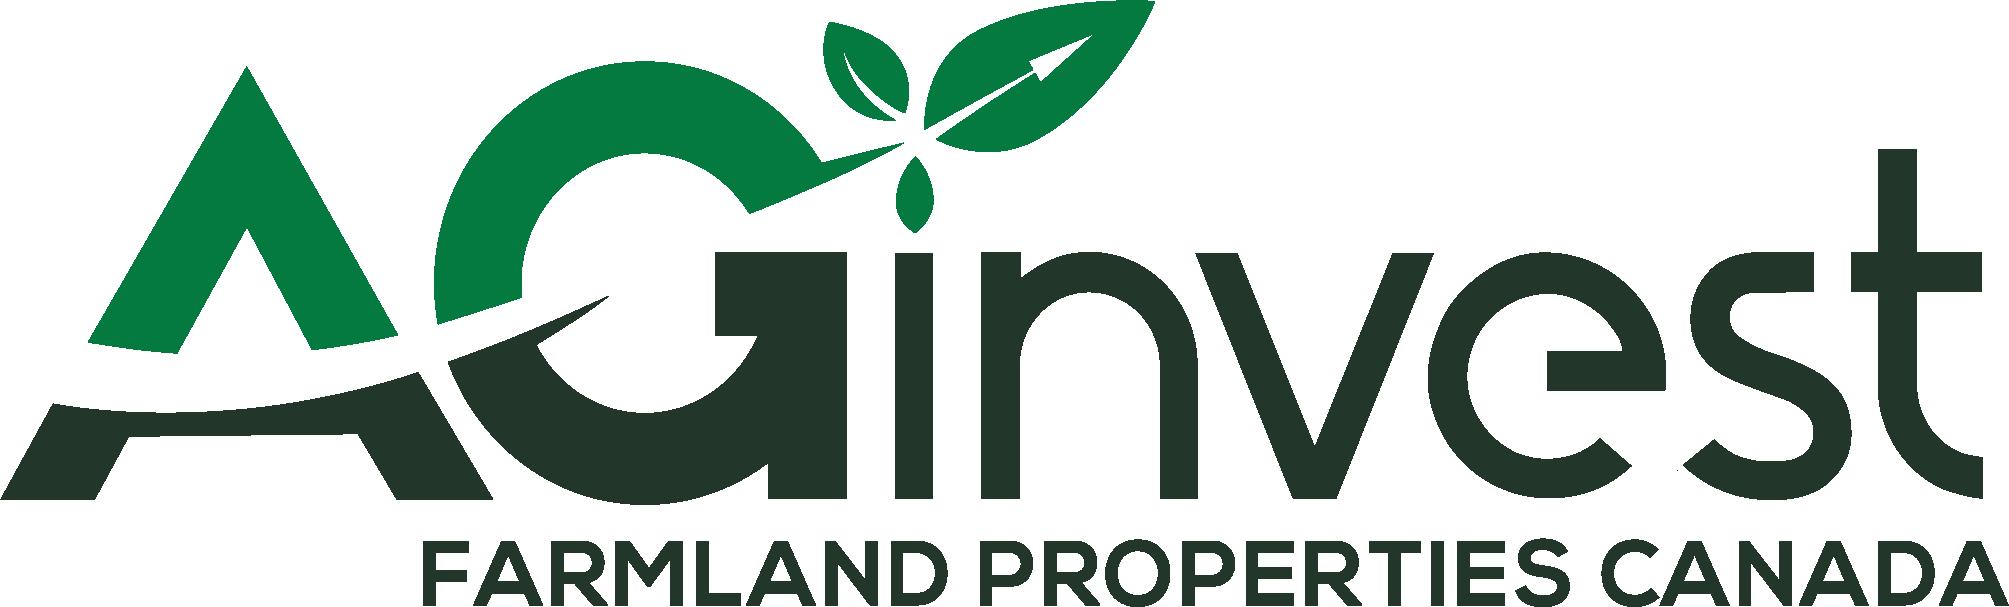 AGinvest Farmland Properties Canada